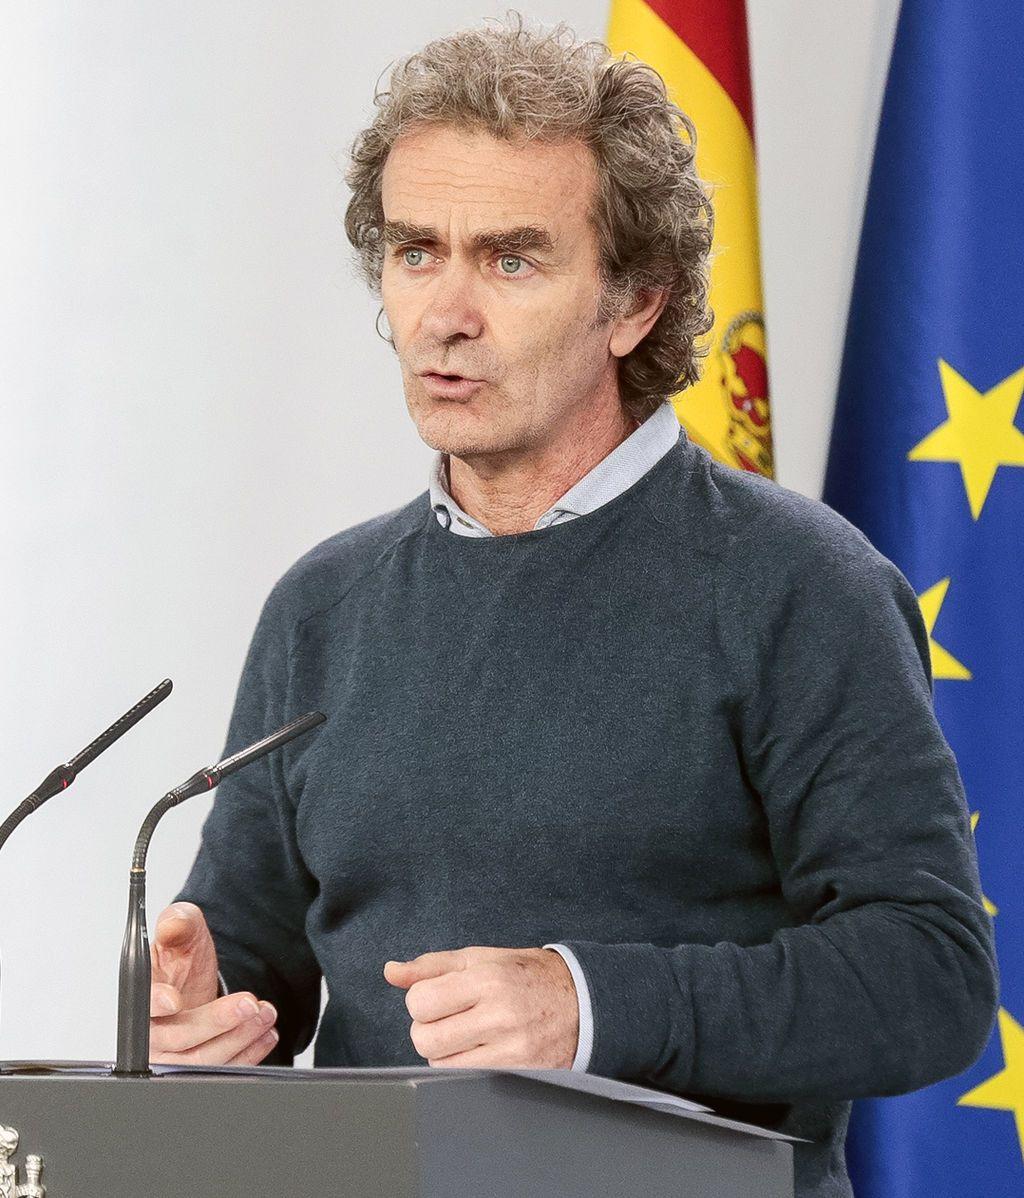 EuropaPress_3055099_director_centro_alertas_emergencias_sanitarias_fernando_simon_comparece